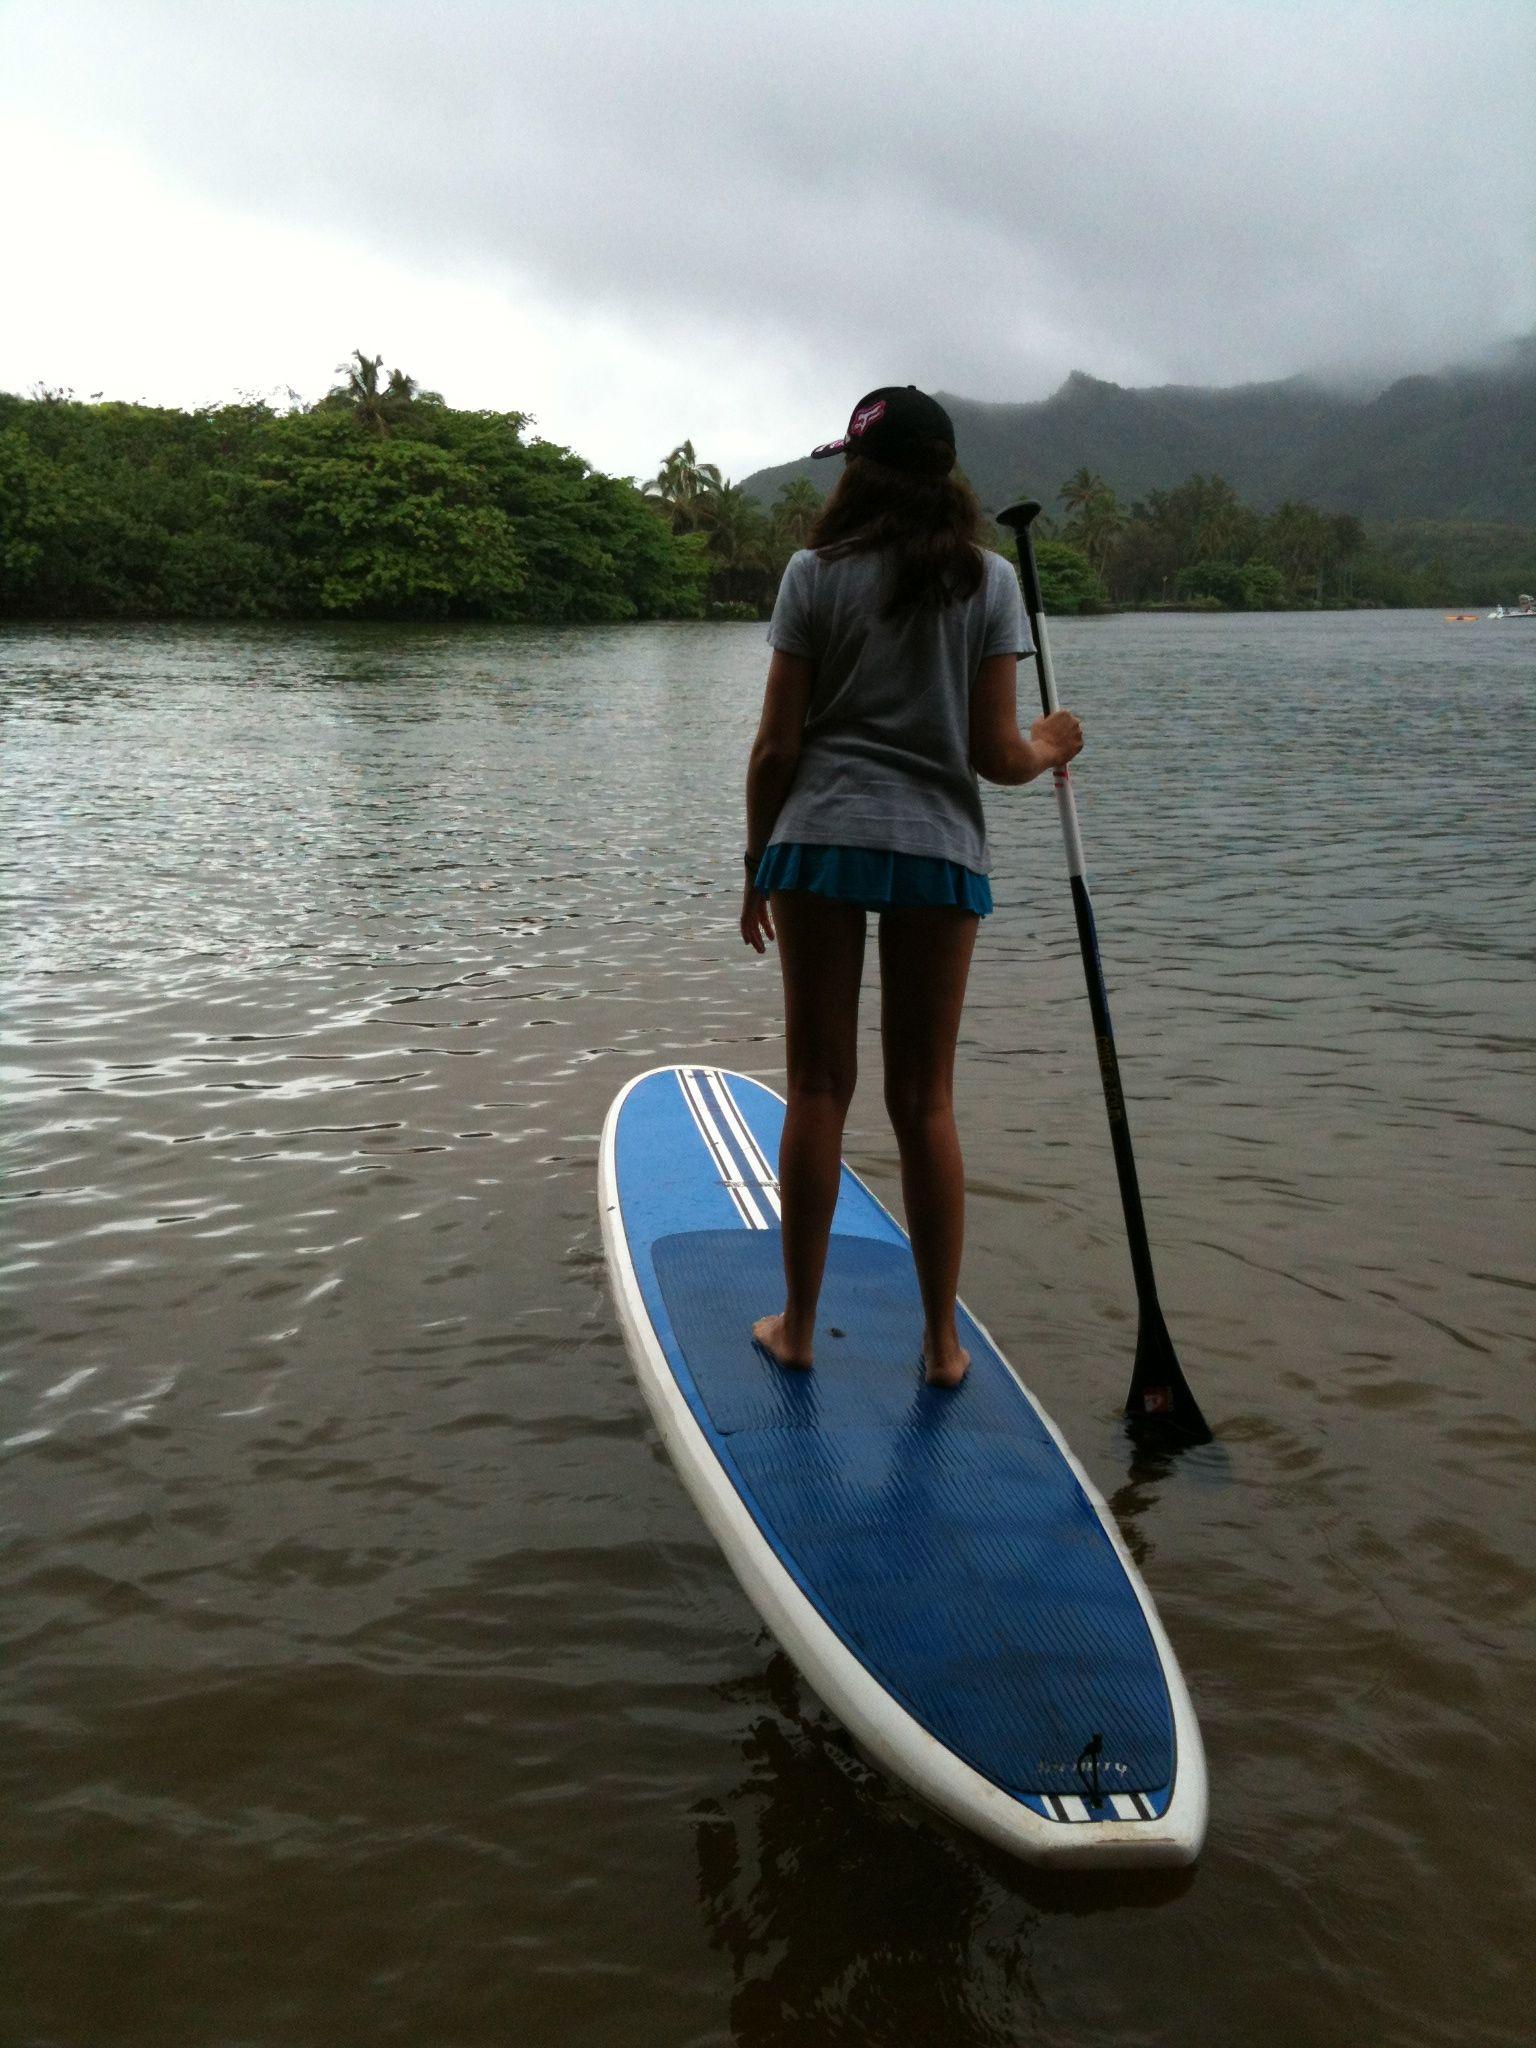 Wailua River Paddle Boarding Paddle Boarding Paddle